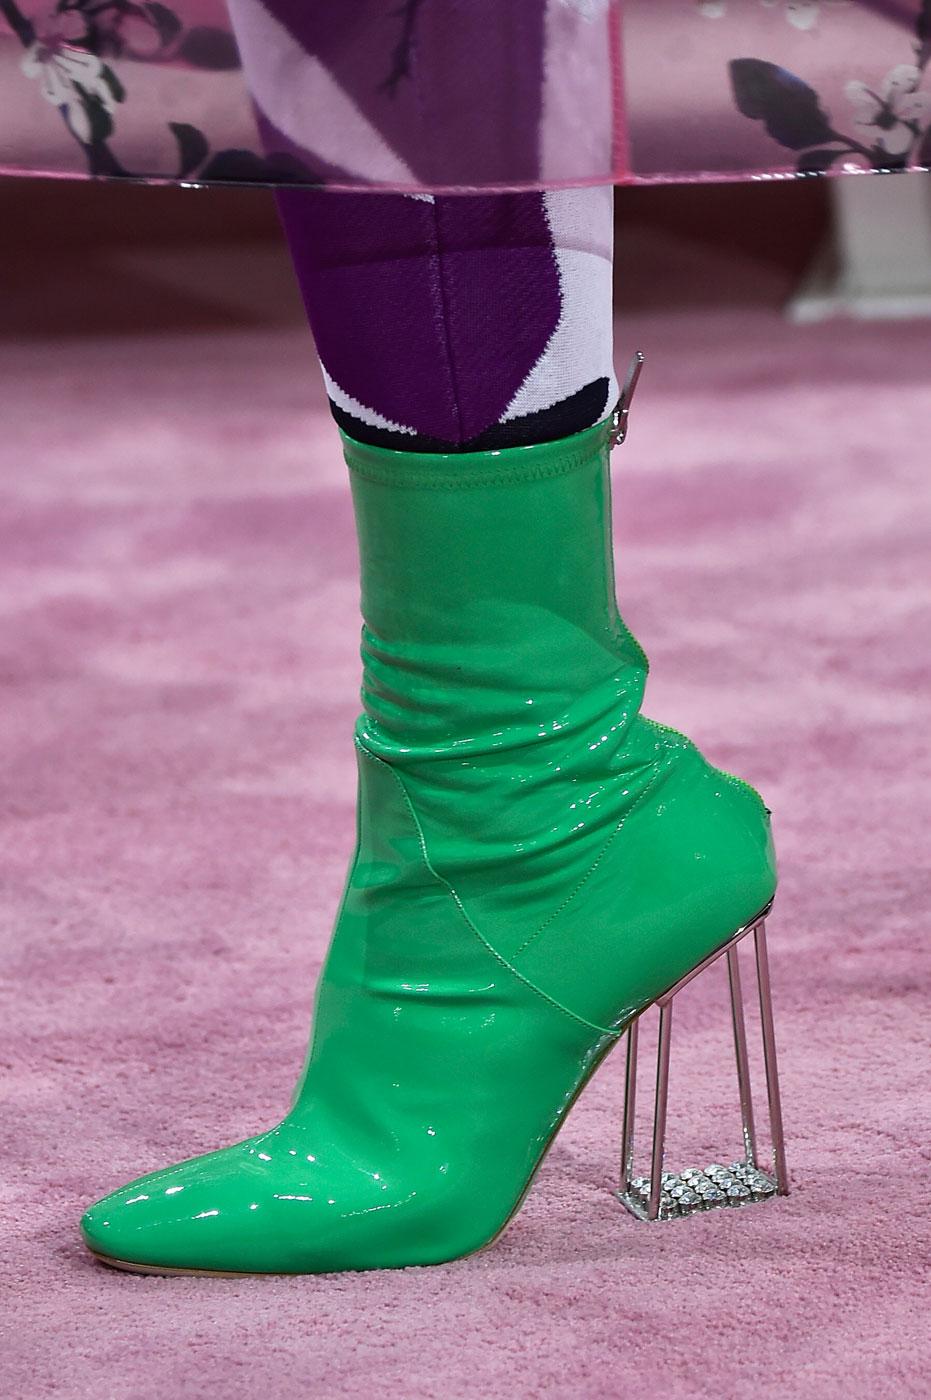 Christian-Dior-fashion-runway-show-close-ups-haute-couture-paris-spring-summer-2015-the-impression-175